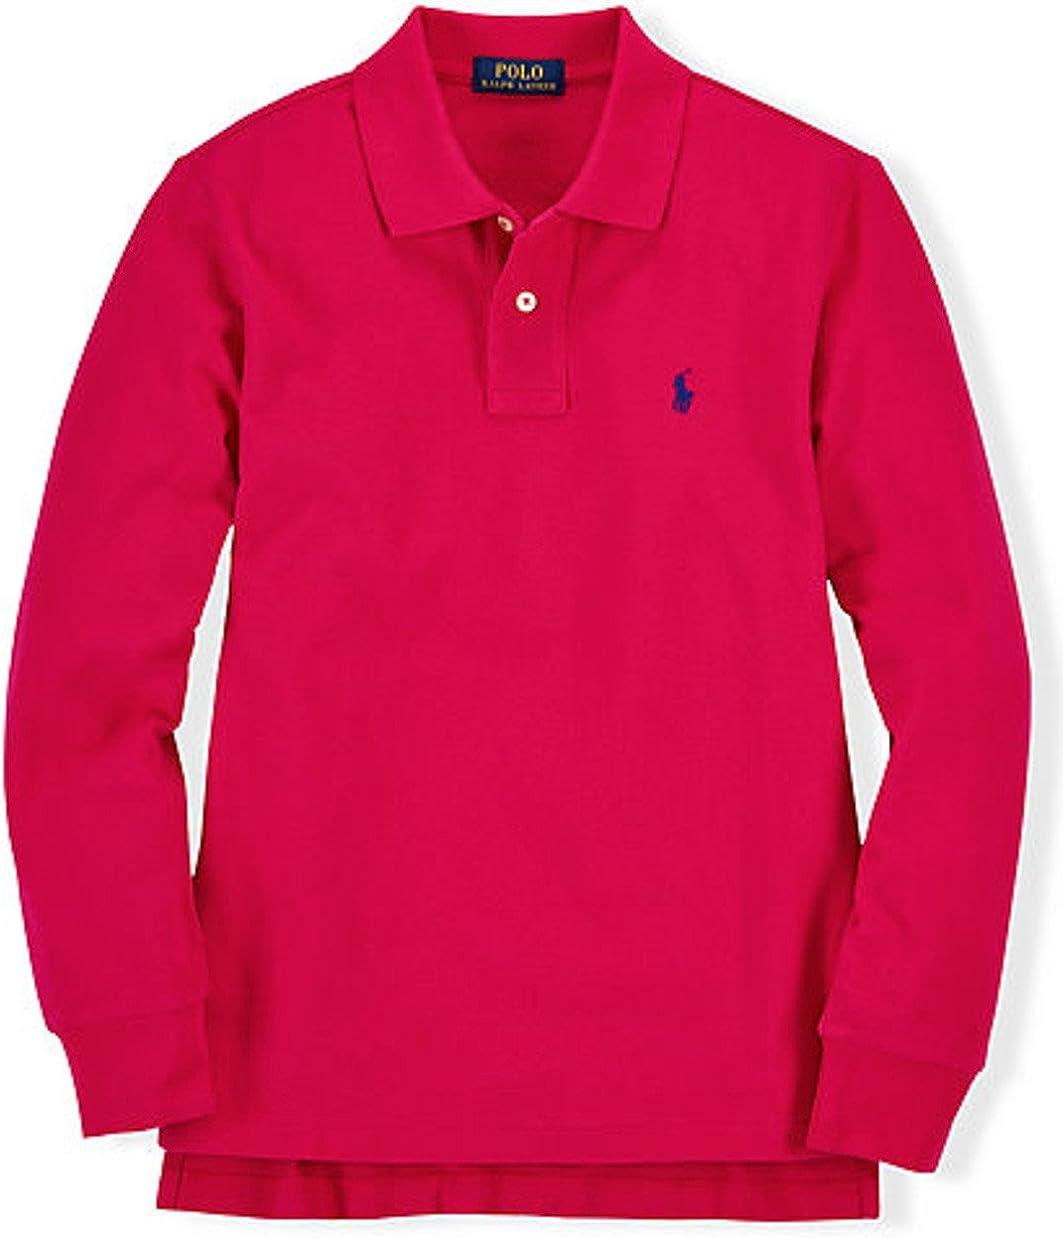 Ralph Lauren Baby Boys' Long Sleeved Polo Shirt